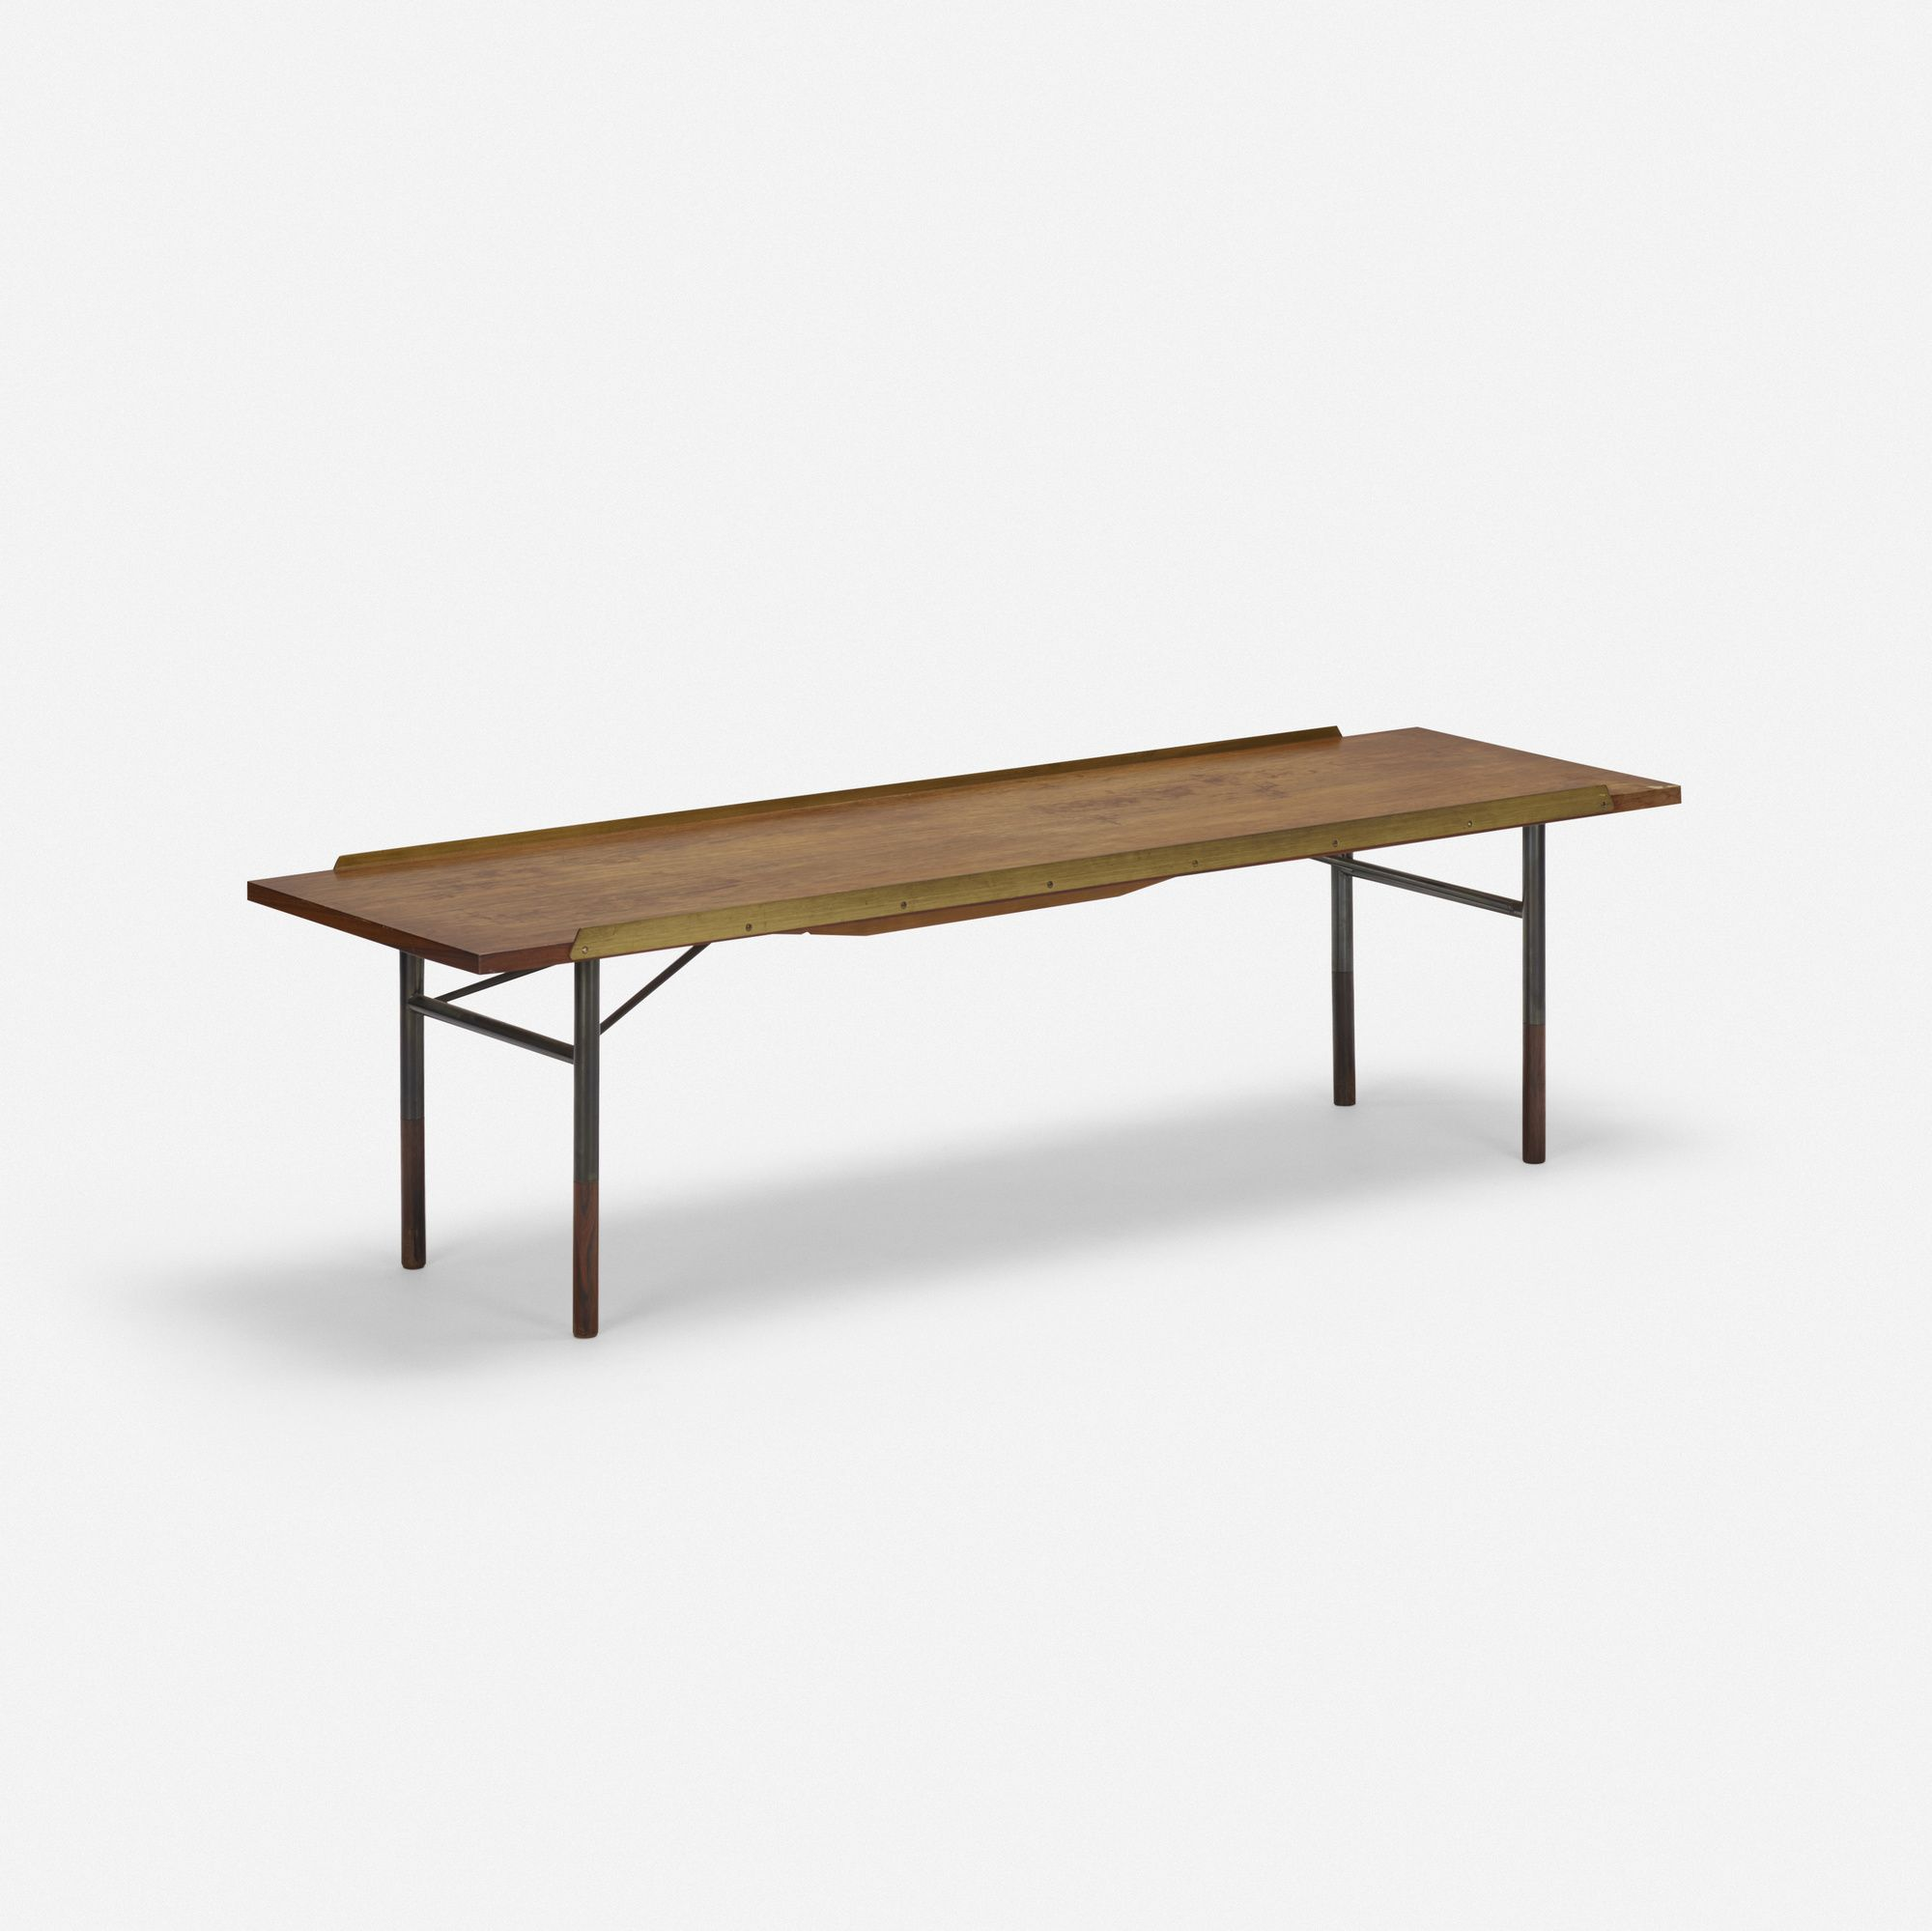 Incredible Lot 257 Finn Juhl Bench 1959 Rosewood Enameled Steel Machost Co Dining Chair Design Ideas Machostcouk